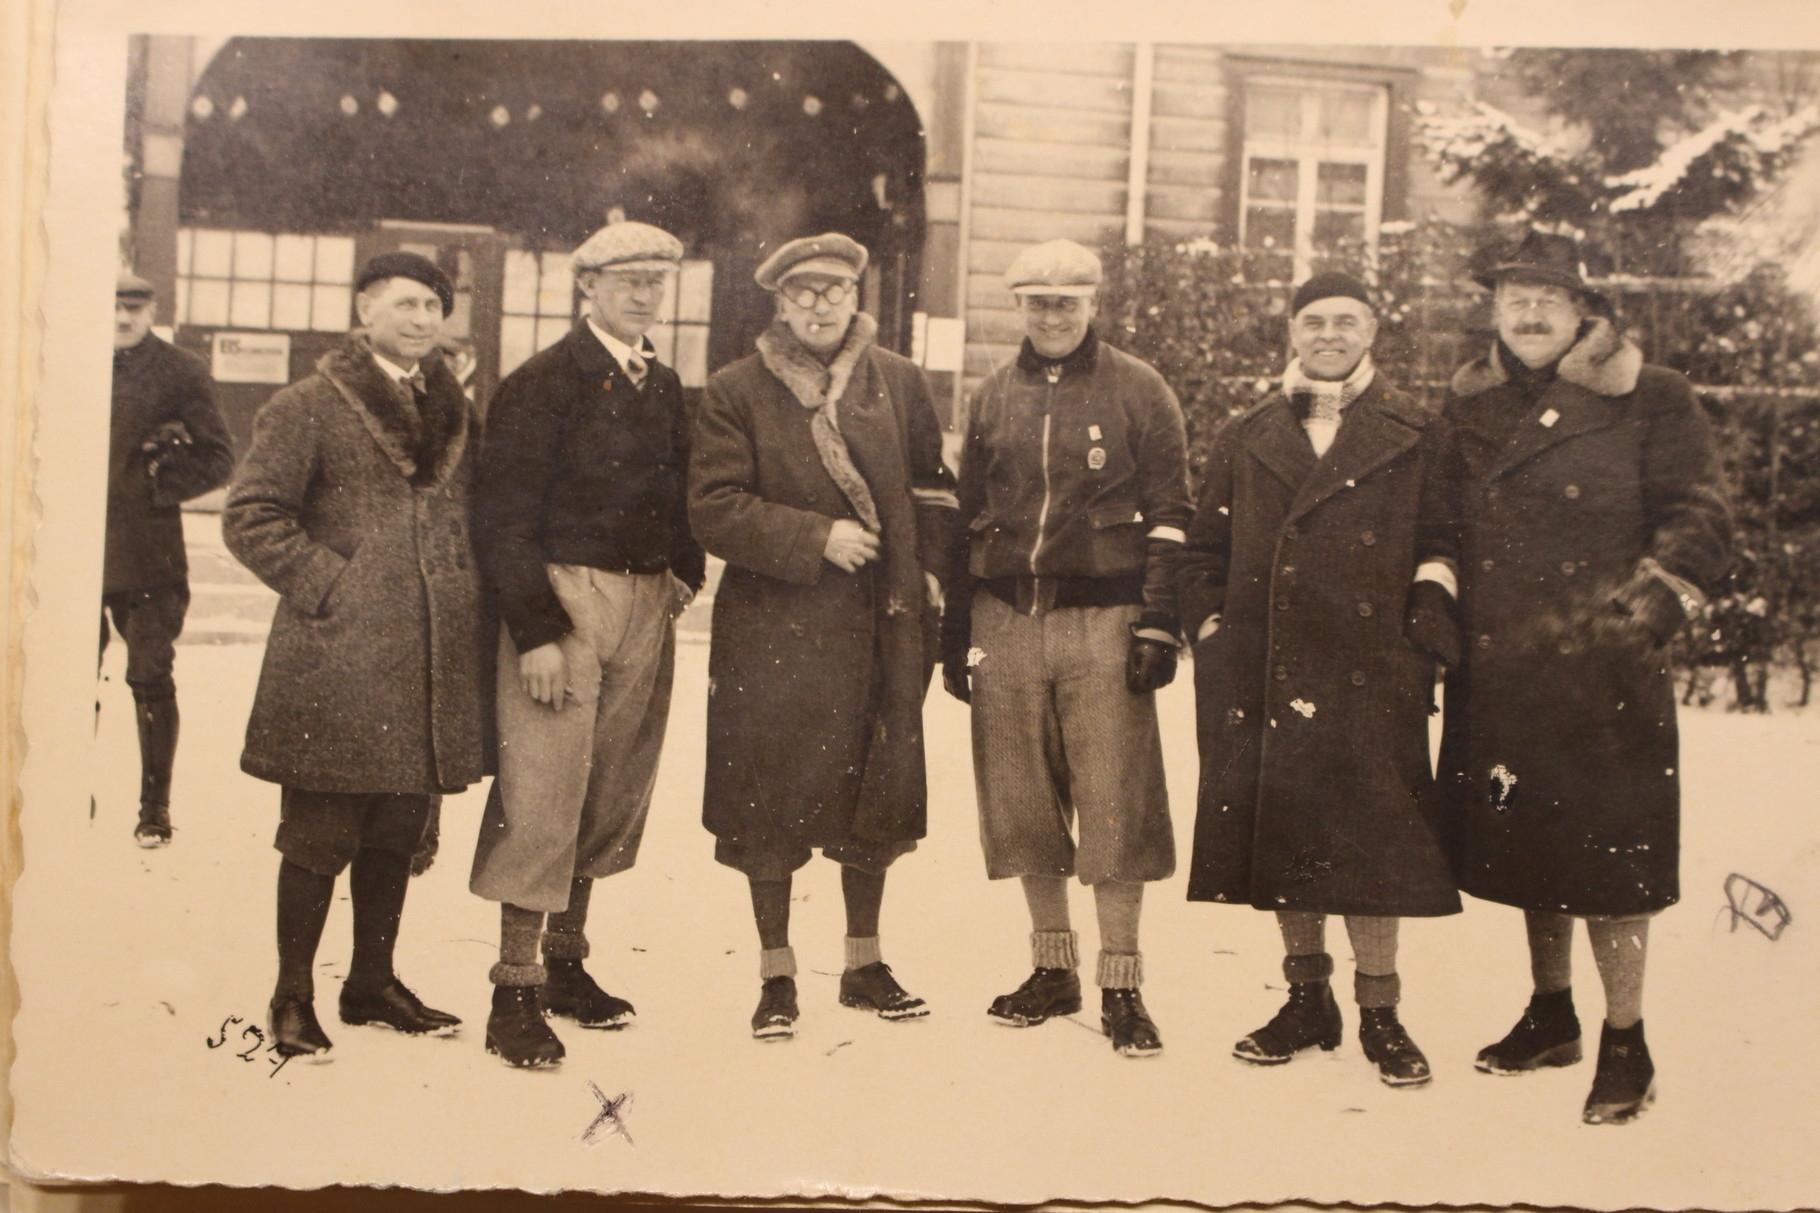 Winterkampfspiele 1934